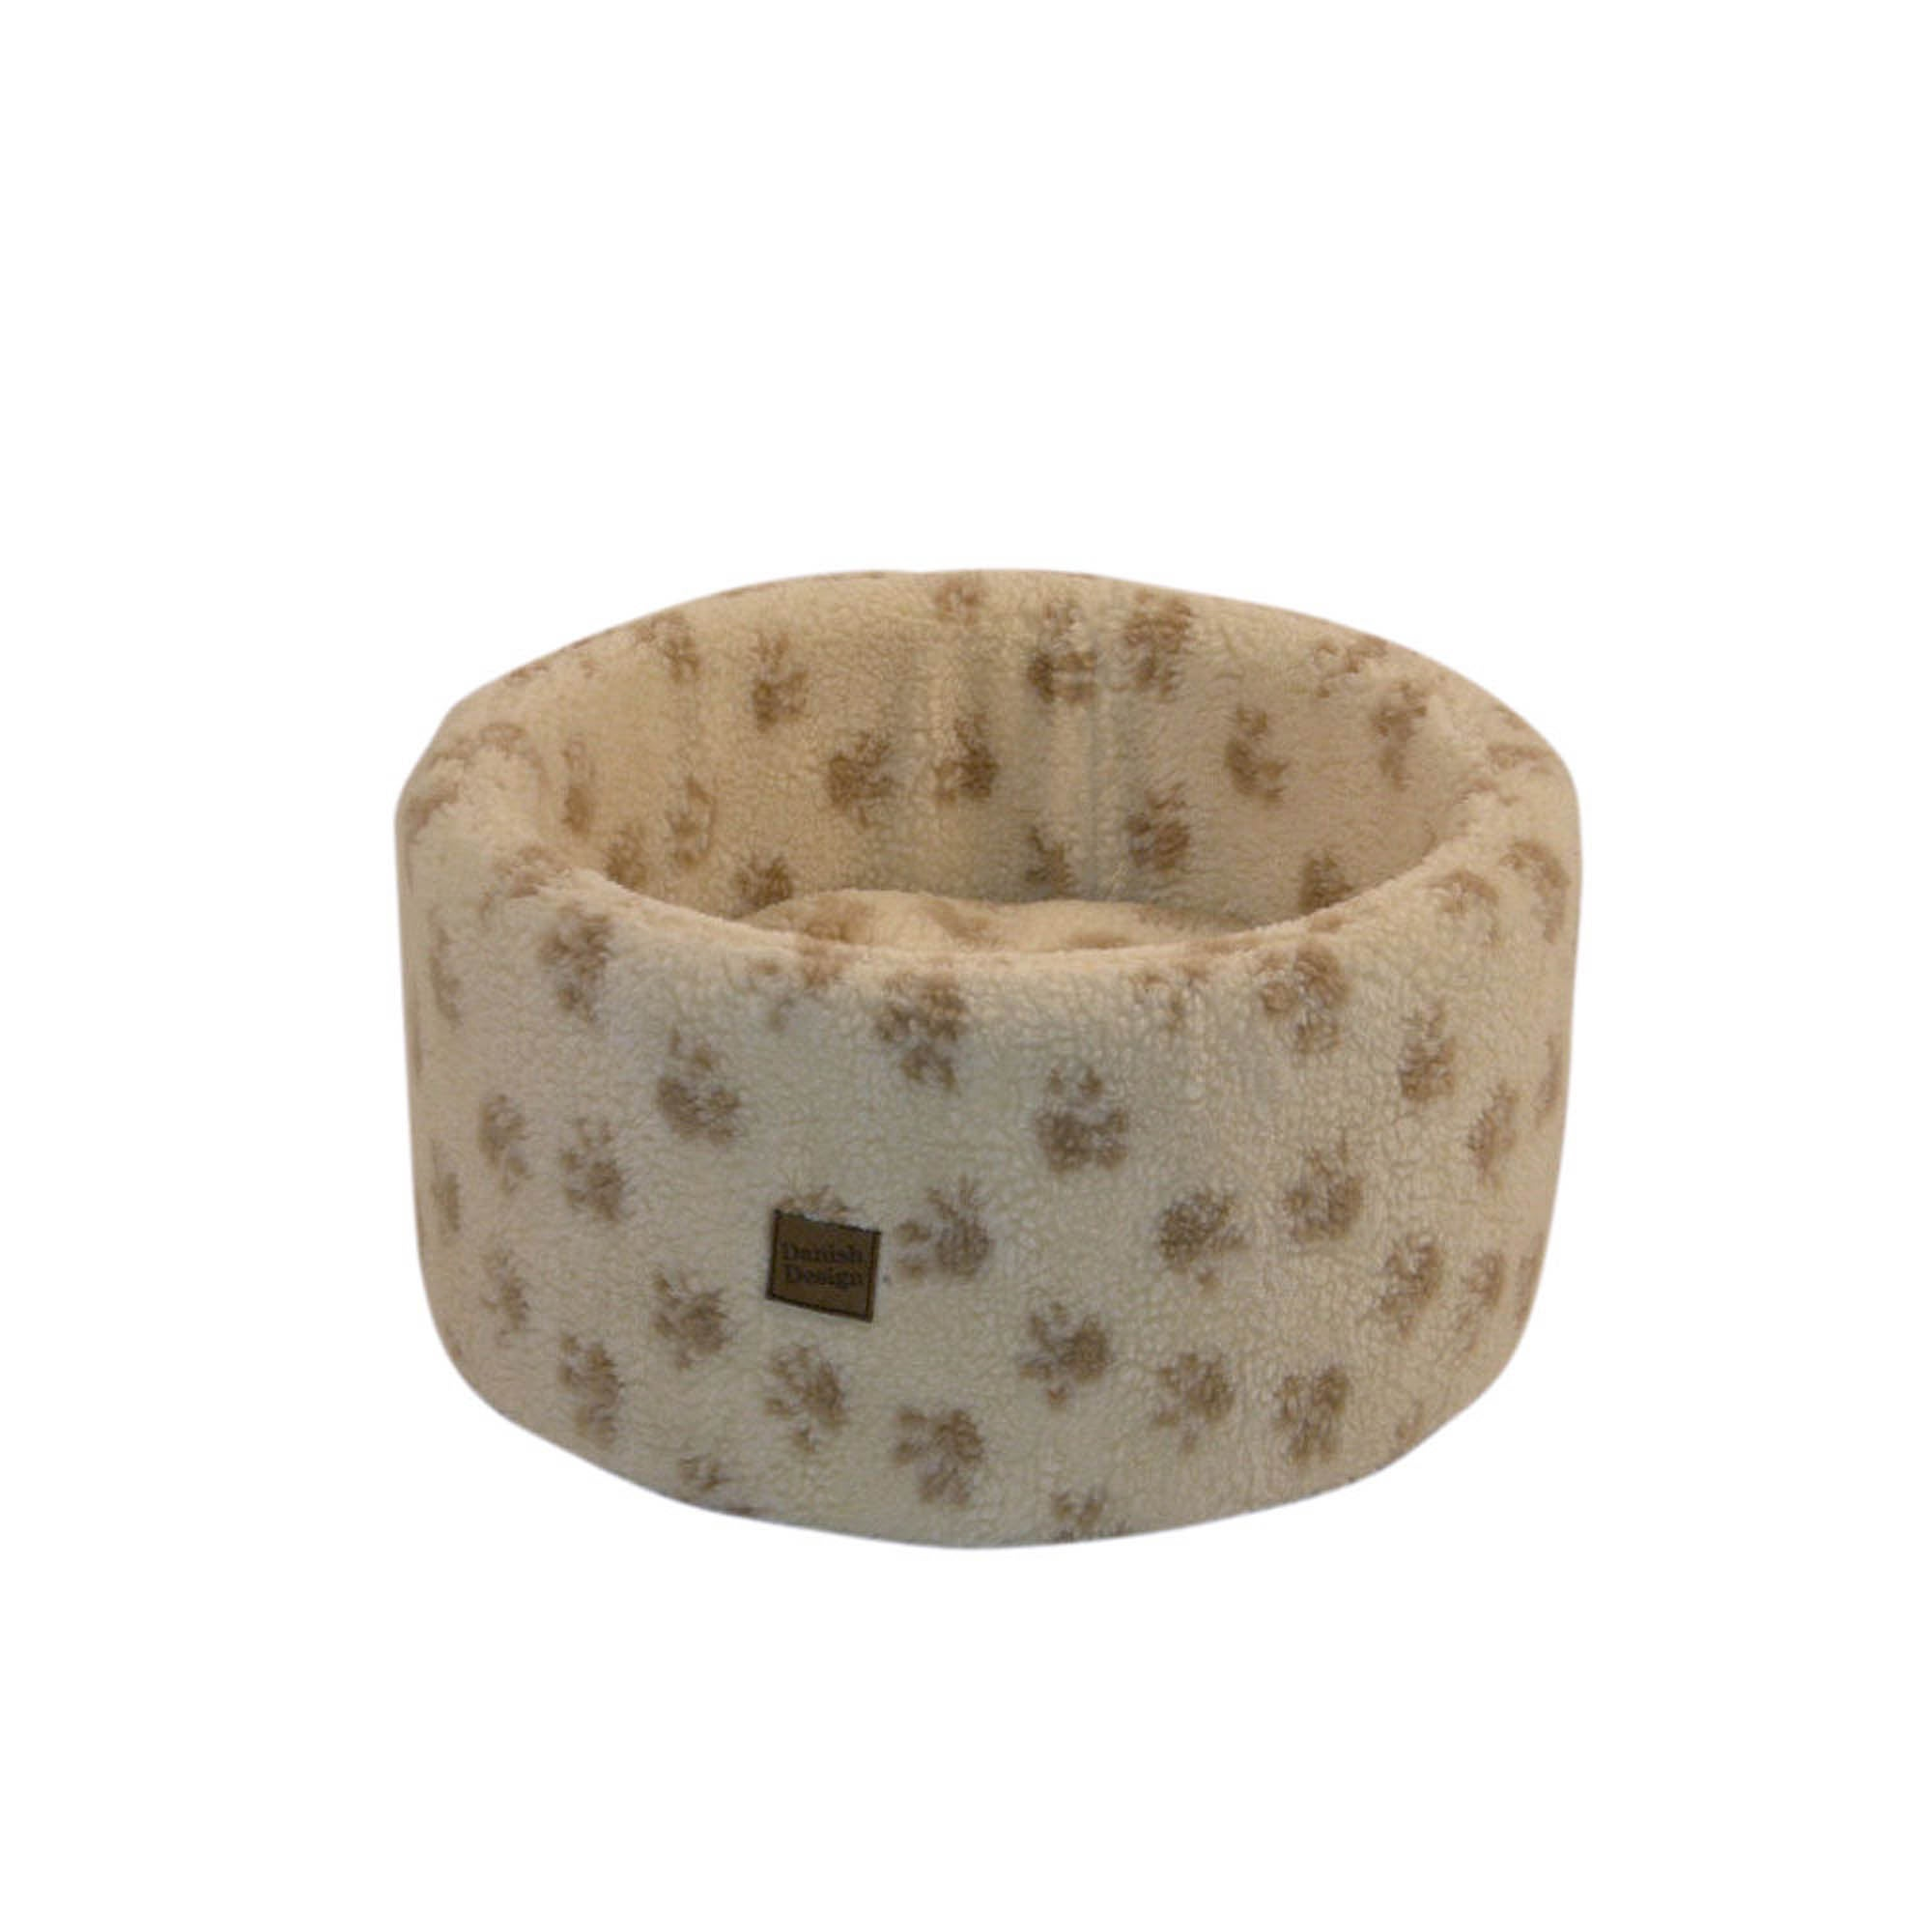 Cream Cosy Cat Bed Almond (Cream)